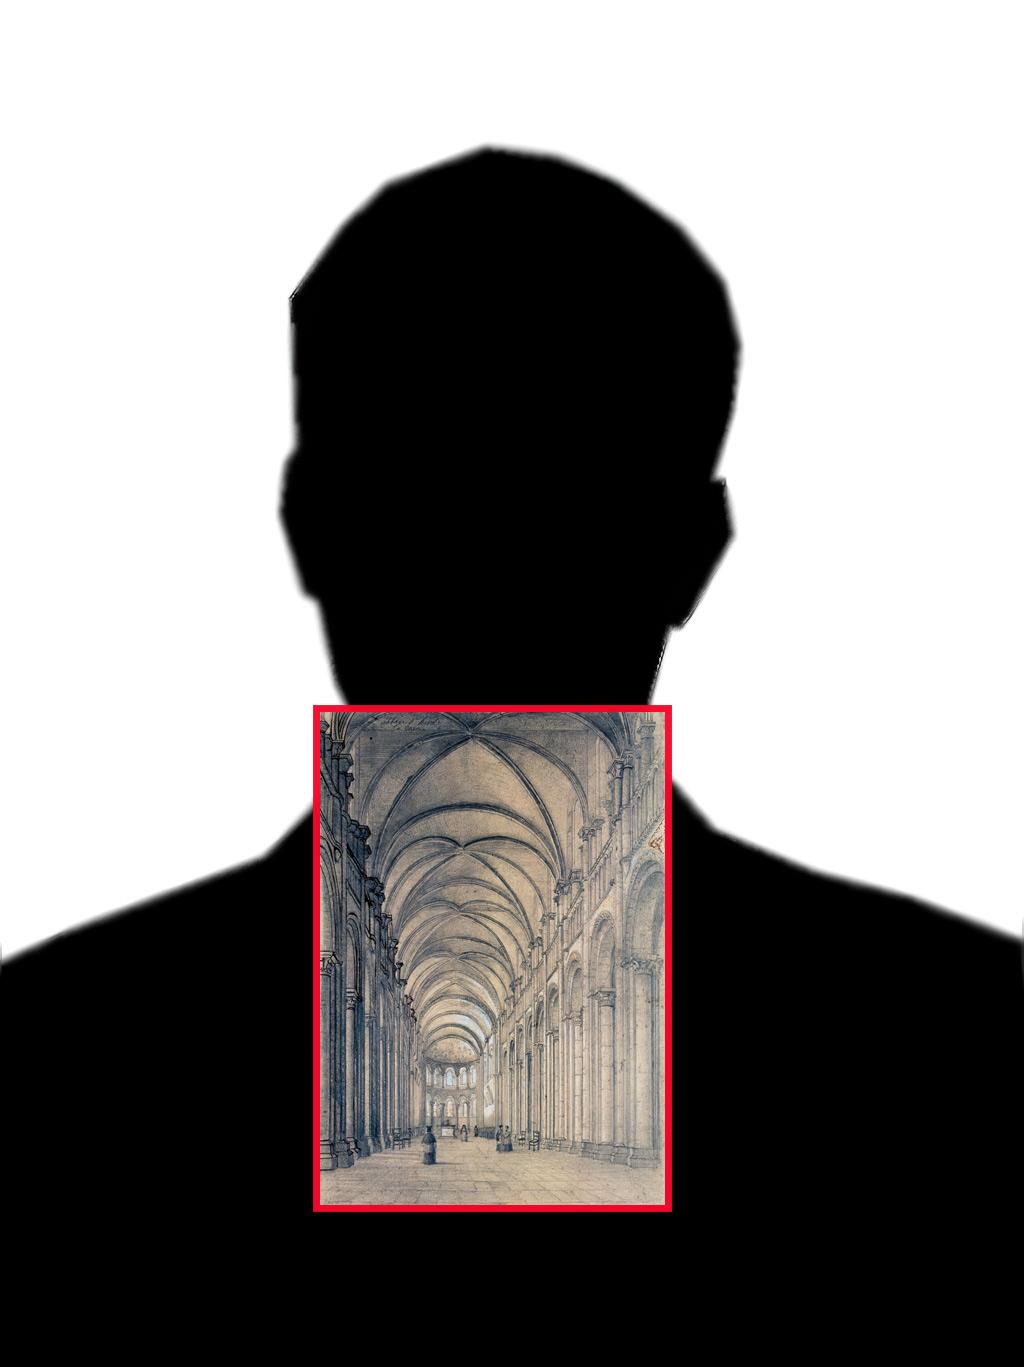 Caen – The Artists – Thorigny, Felix